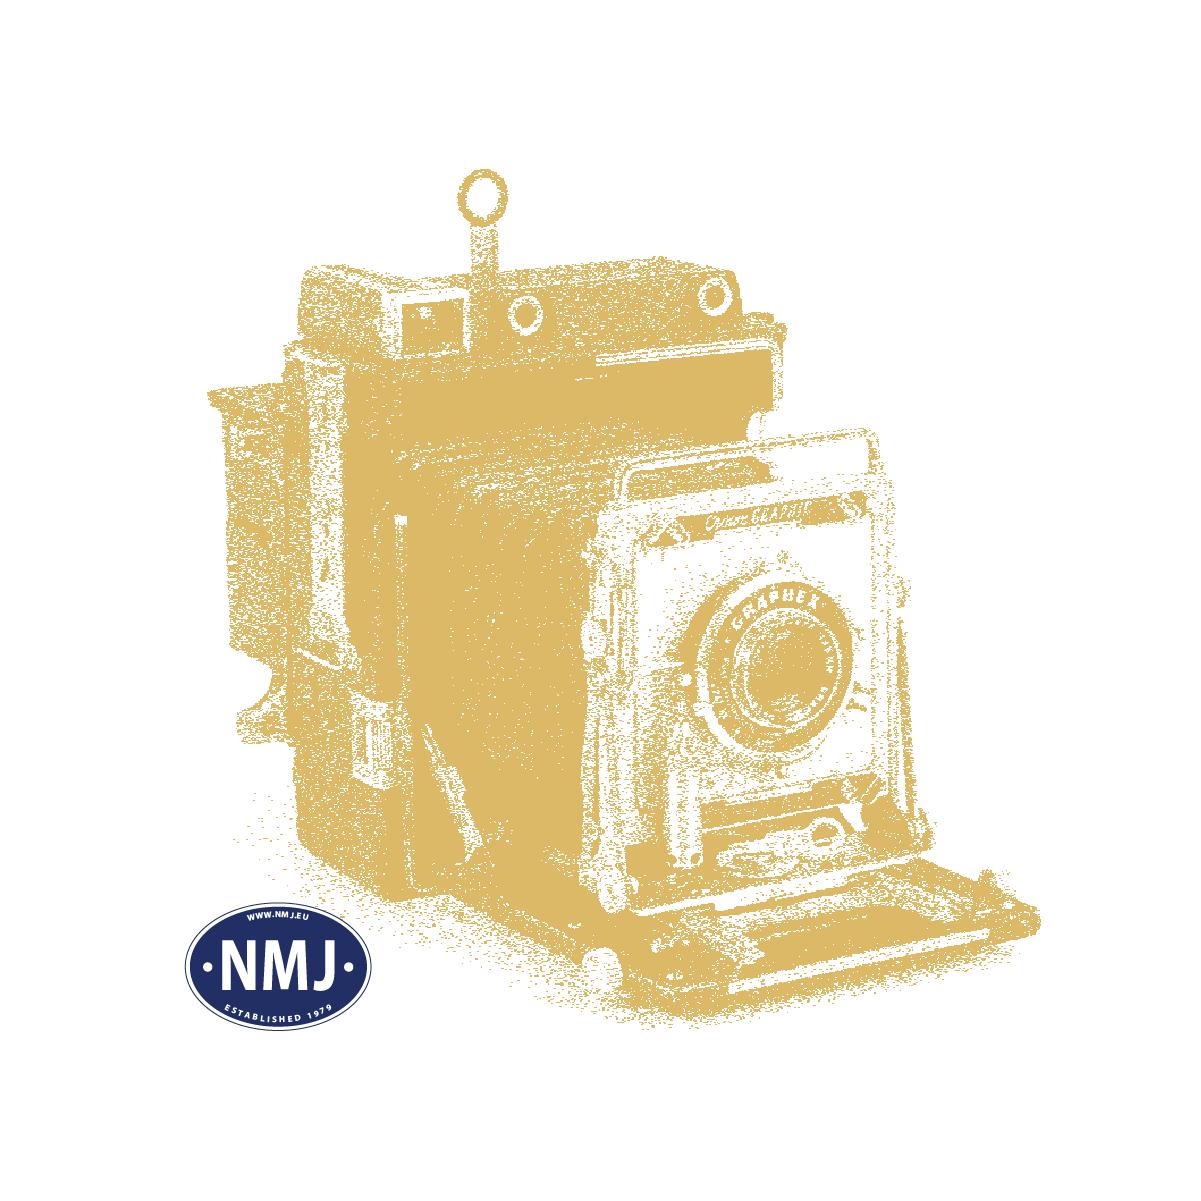 NMJT145006 - NMJ Topline NSB Di3.602, Nydesign GM og OL-1994 Logo, DCC m/ Lyd, 0-Skala